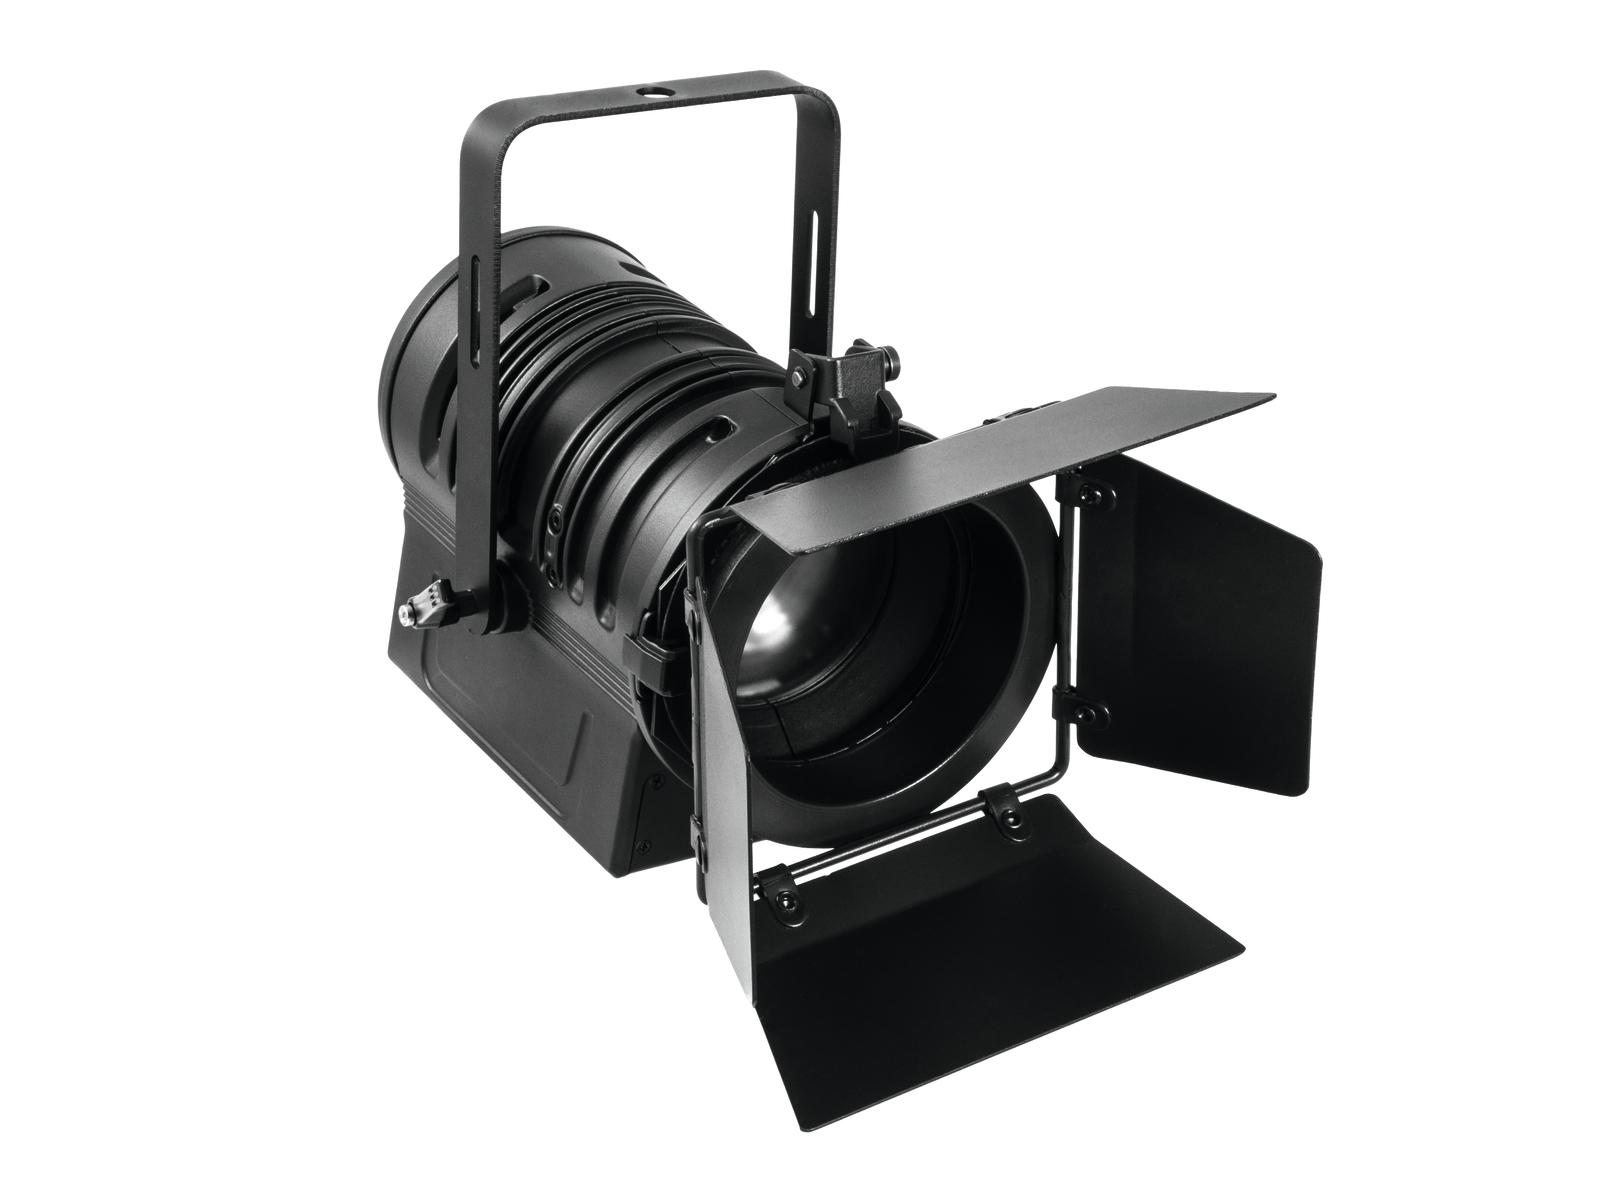 Eurolite LED THA-40PC DL divadelní reflektor, černý